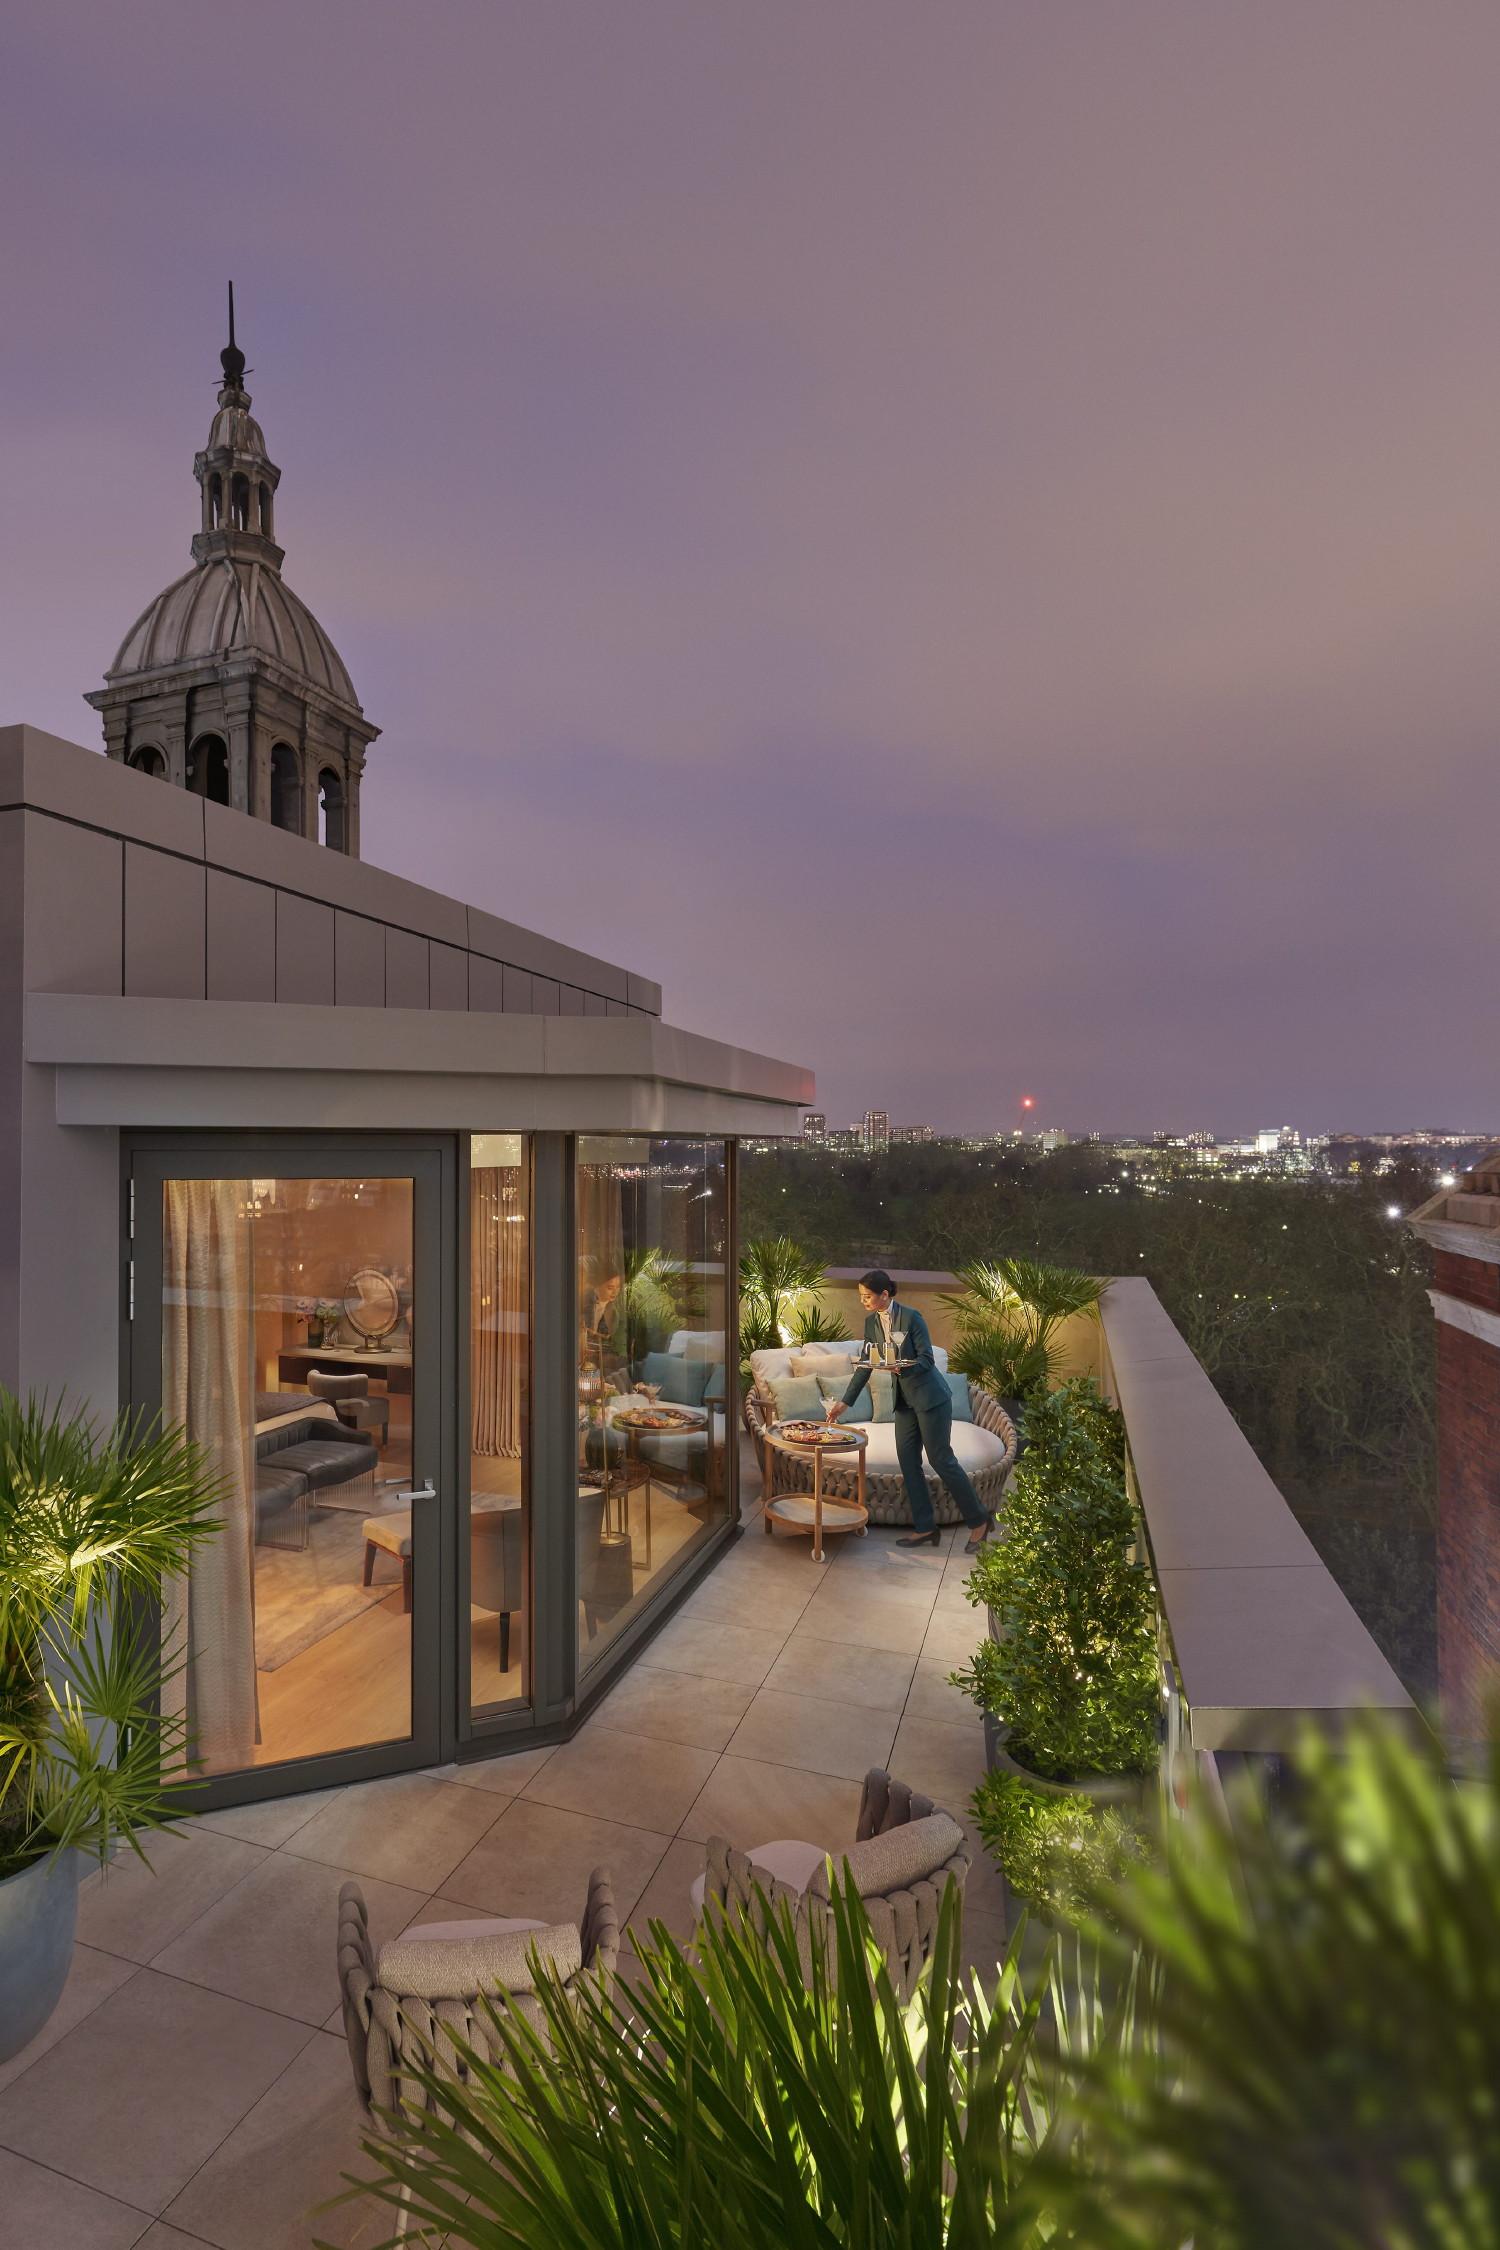 london-2019-suite-penthouse-terrace-01B